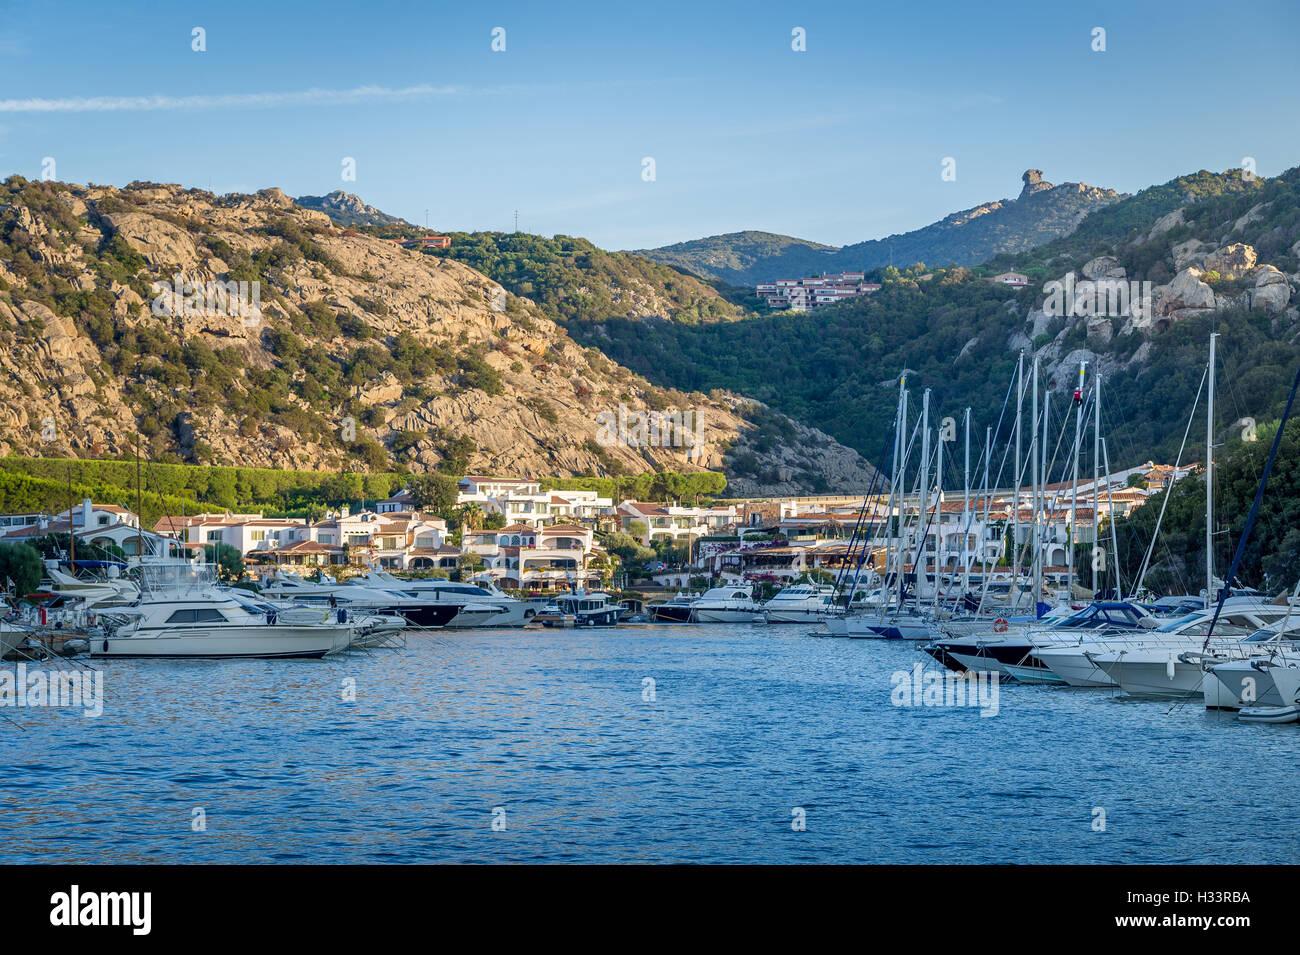 Poltu Quatu Luxusresort & Marina, Sardinien, Italien. Stockbild